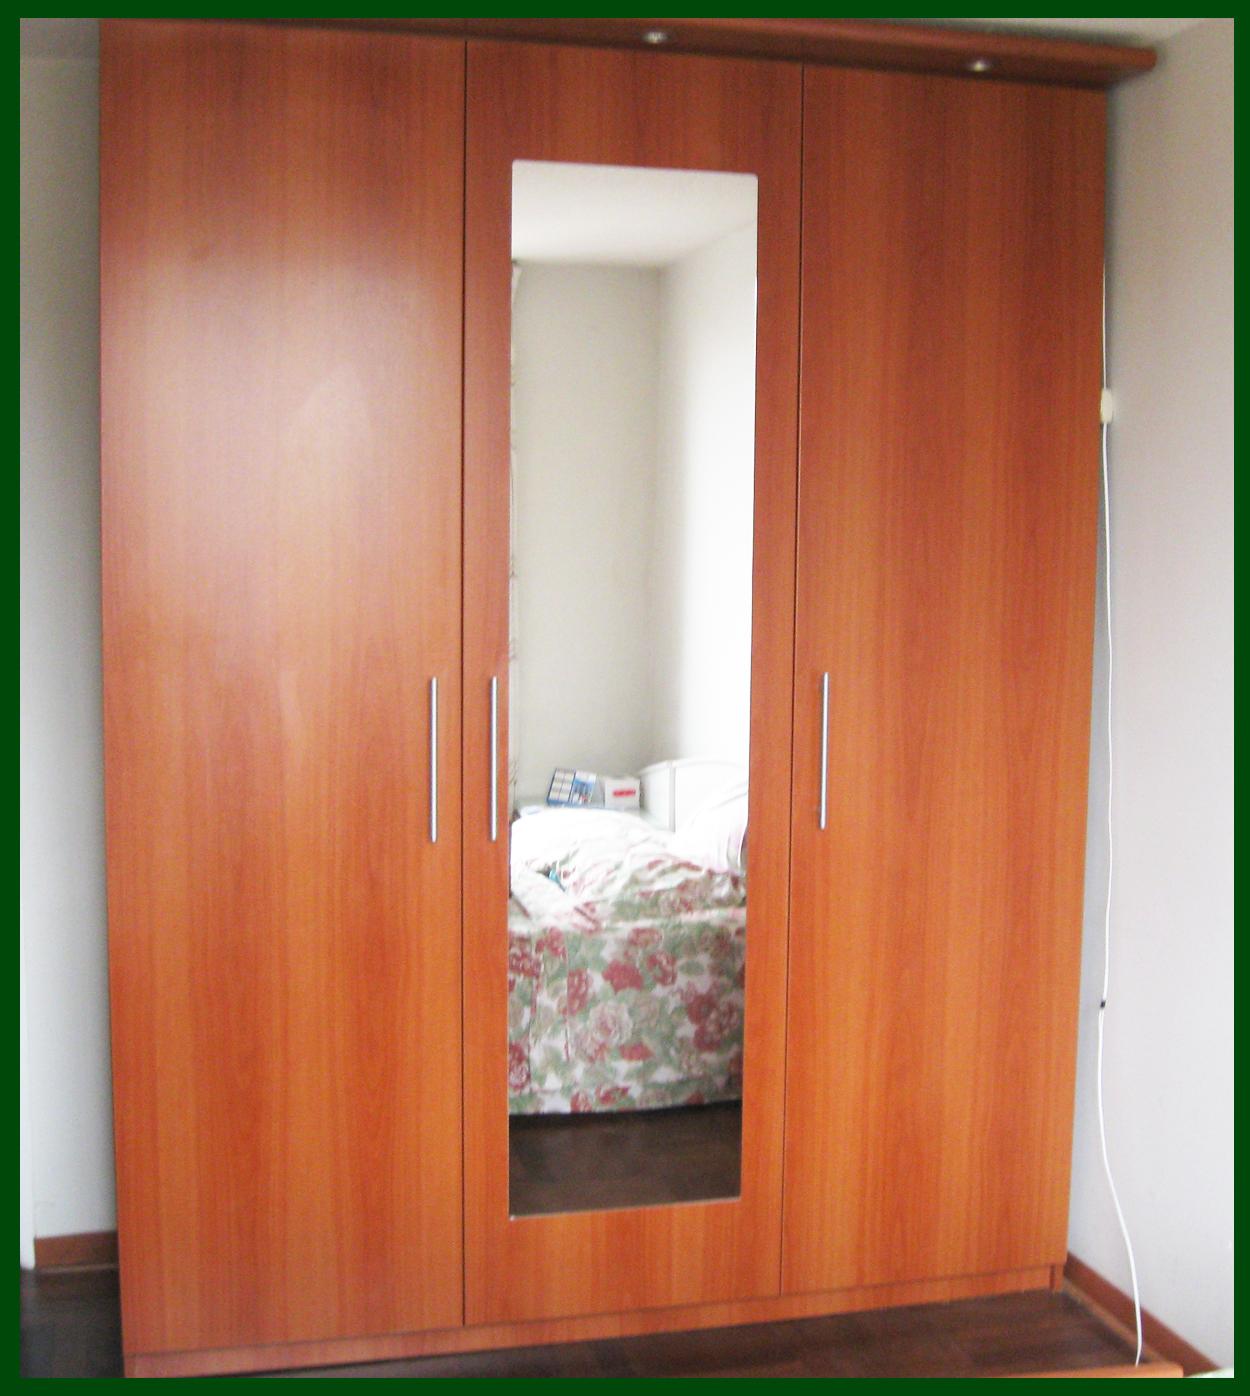 Modelos de closet en mdf imagui for Modelos de puertas para closet